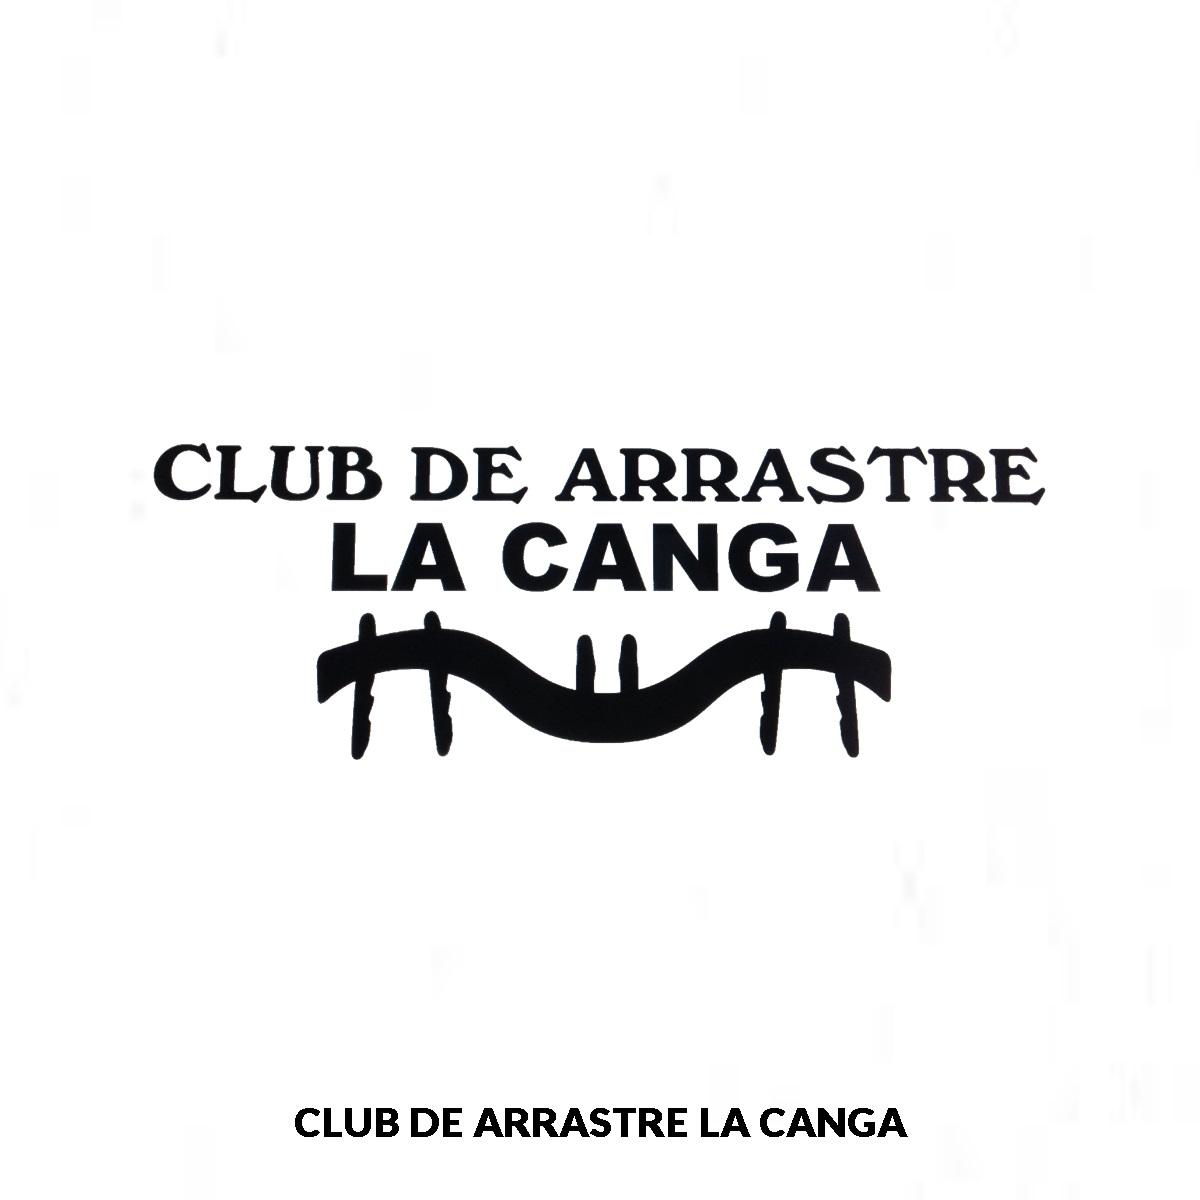 CLUB DE ARRASTRE LA CANGA